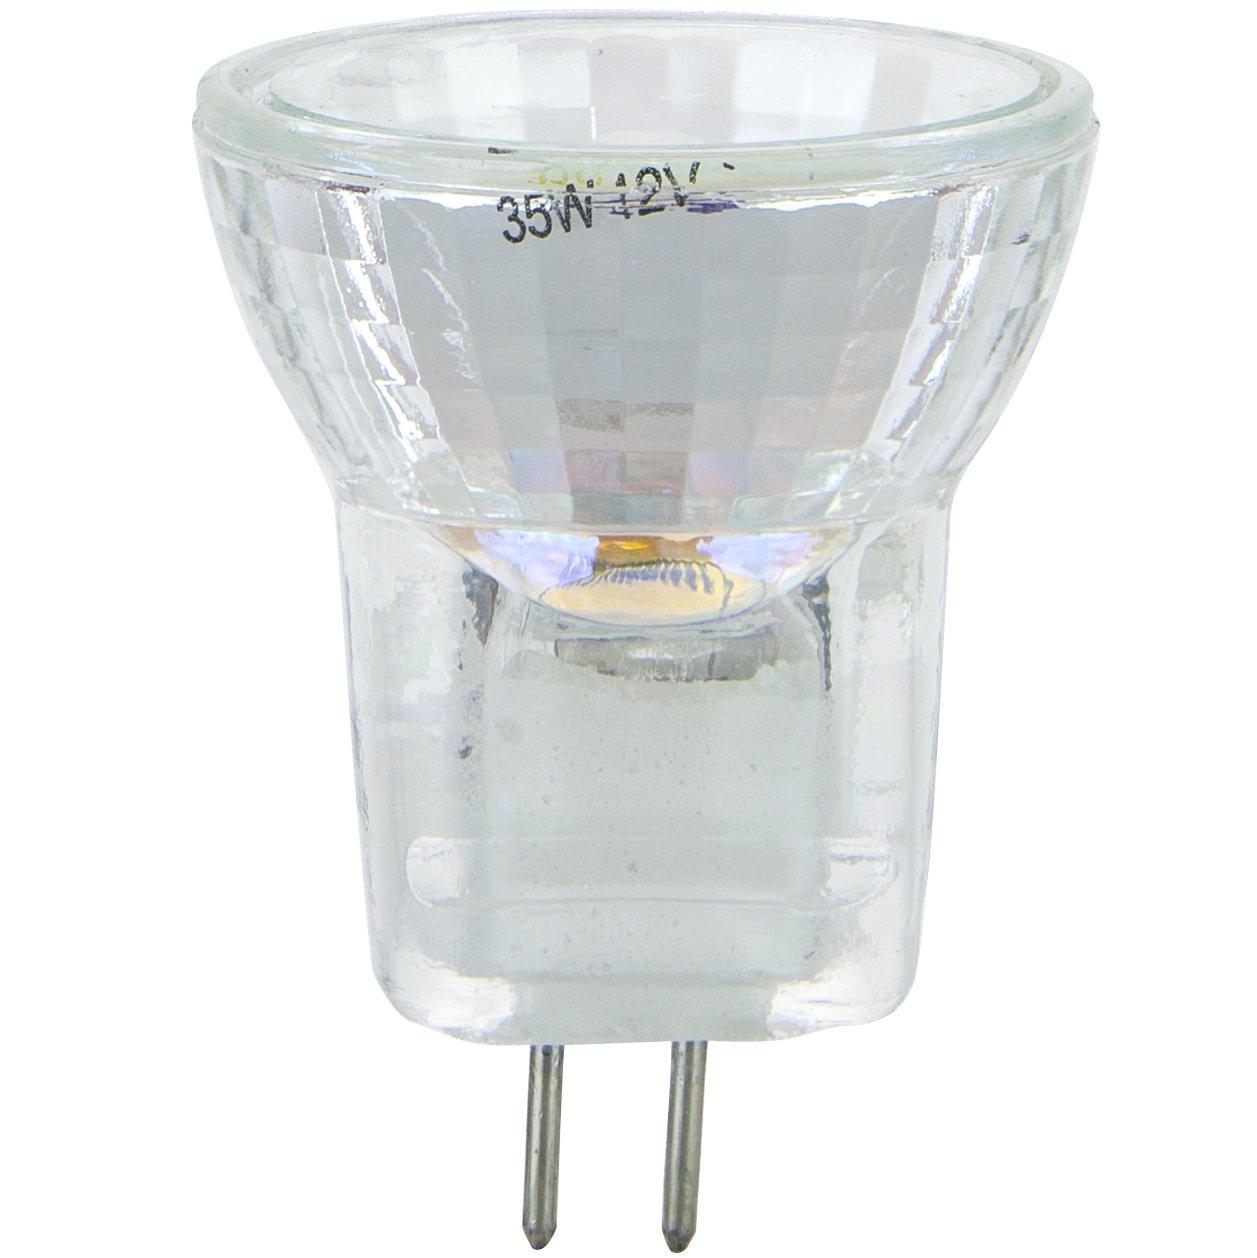 Sunlite 35MR8 CG SP 12V 35 Watt Halogen MR8 G4 Based Mini Reflector Bulb Cover Guard